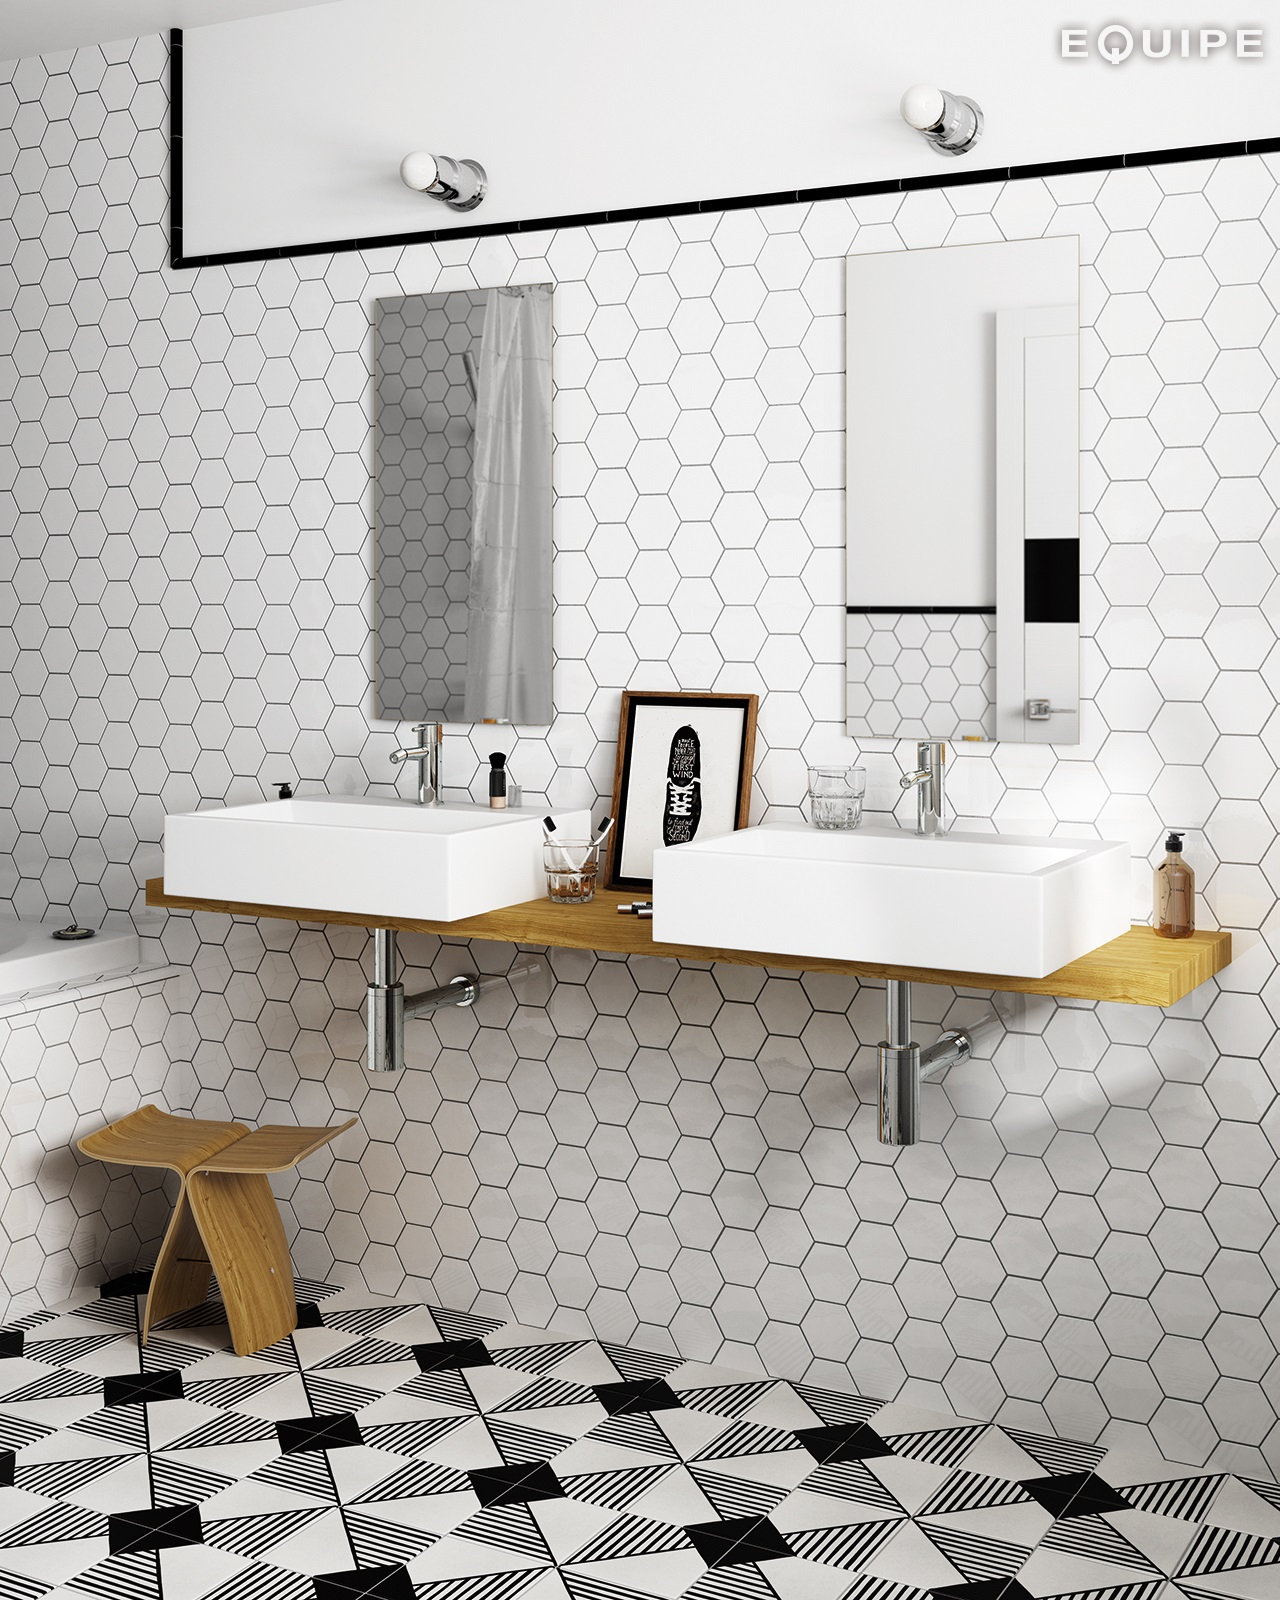 scale equipe ceramicas. Black Bedroom Furniture Sets. Home Design Ideas